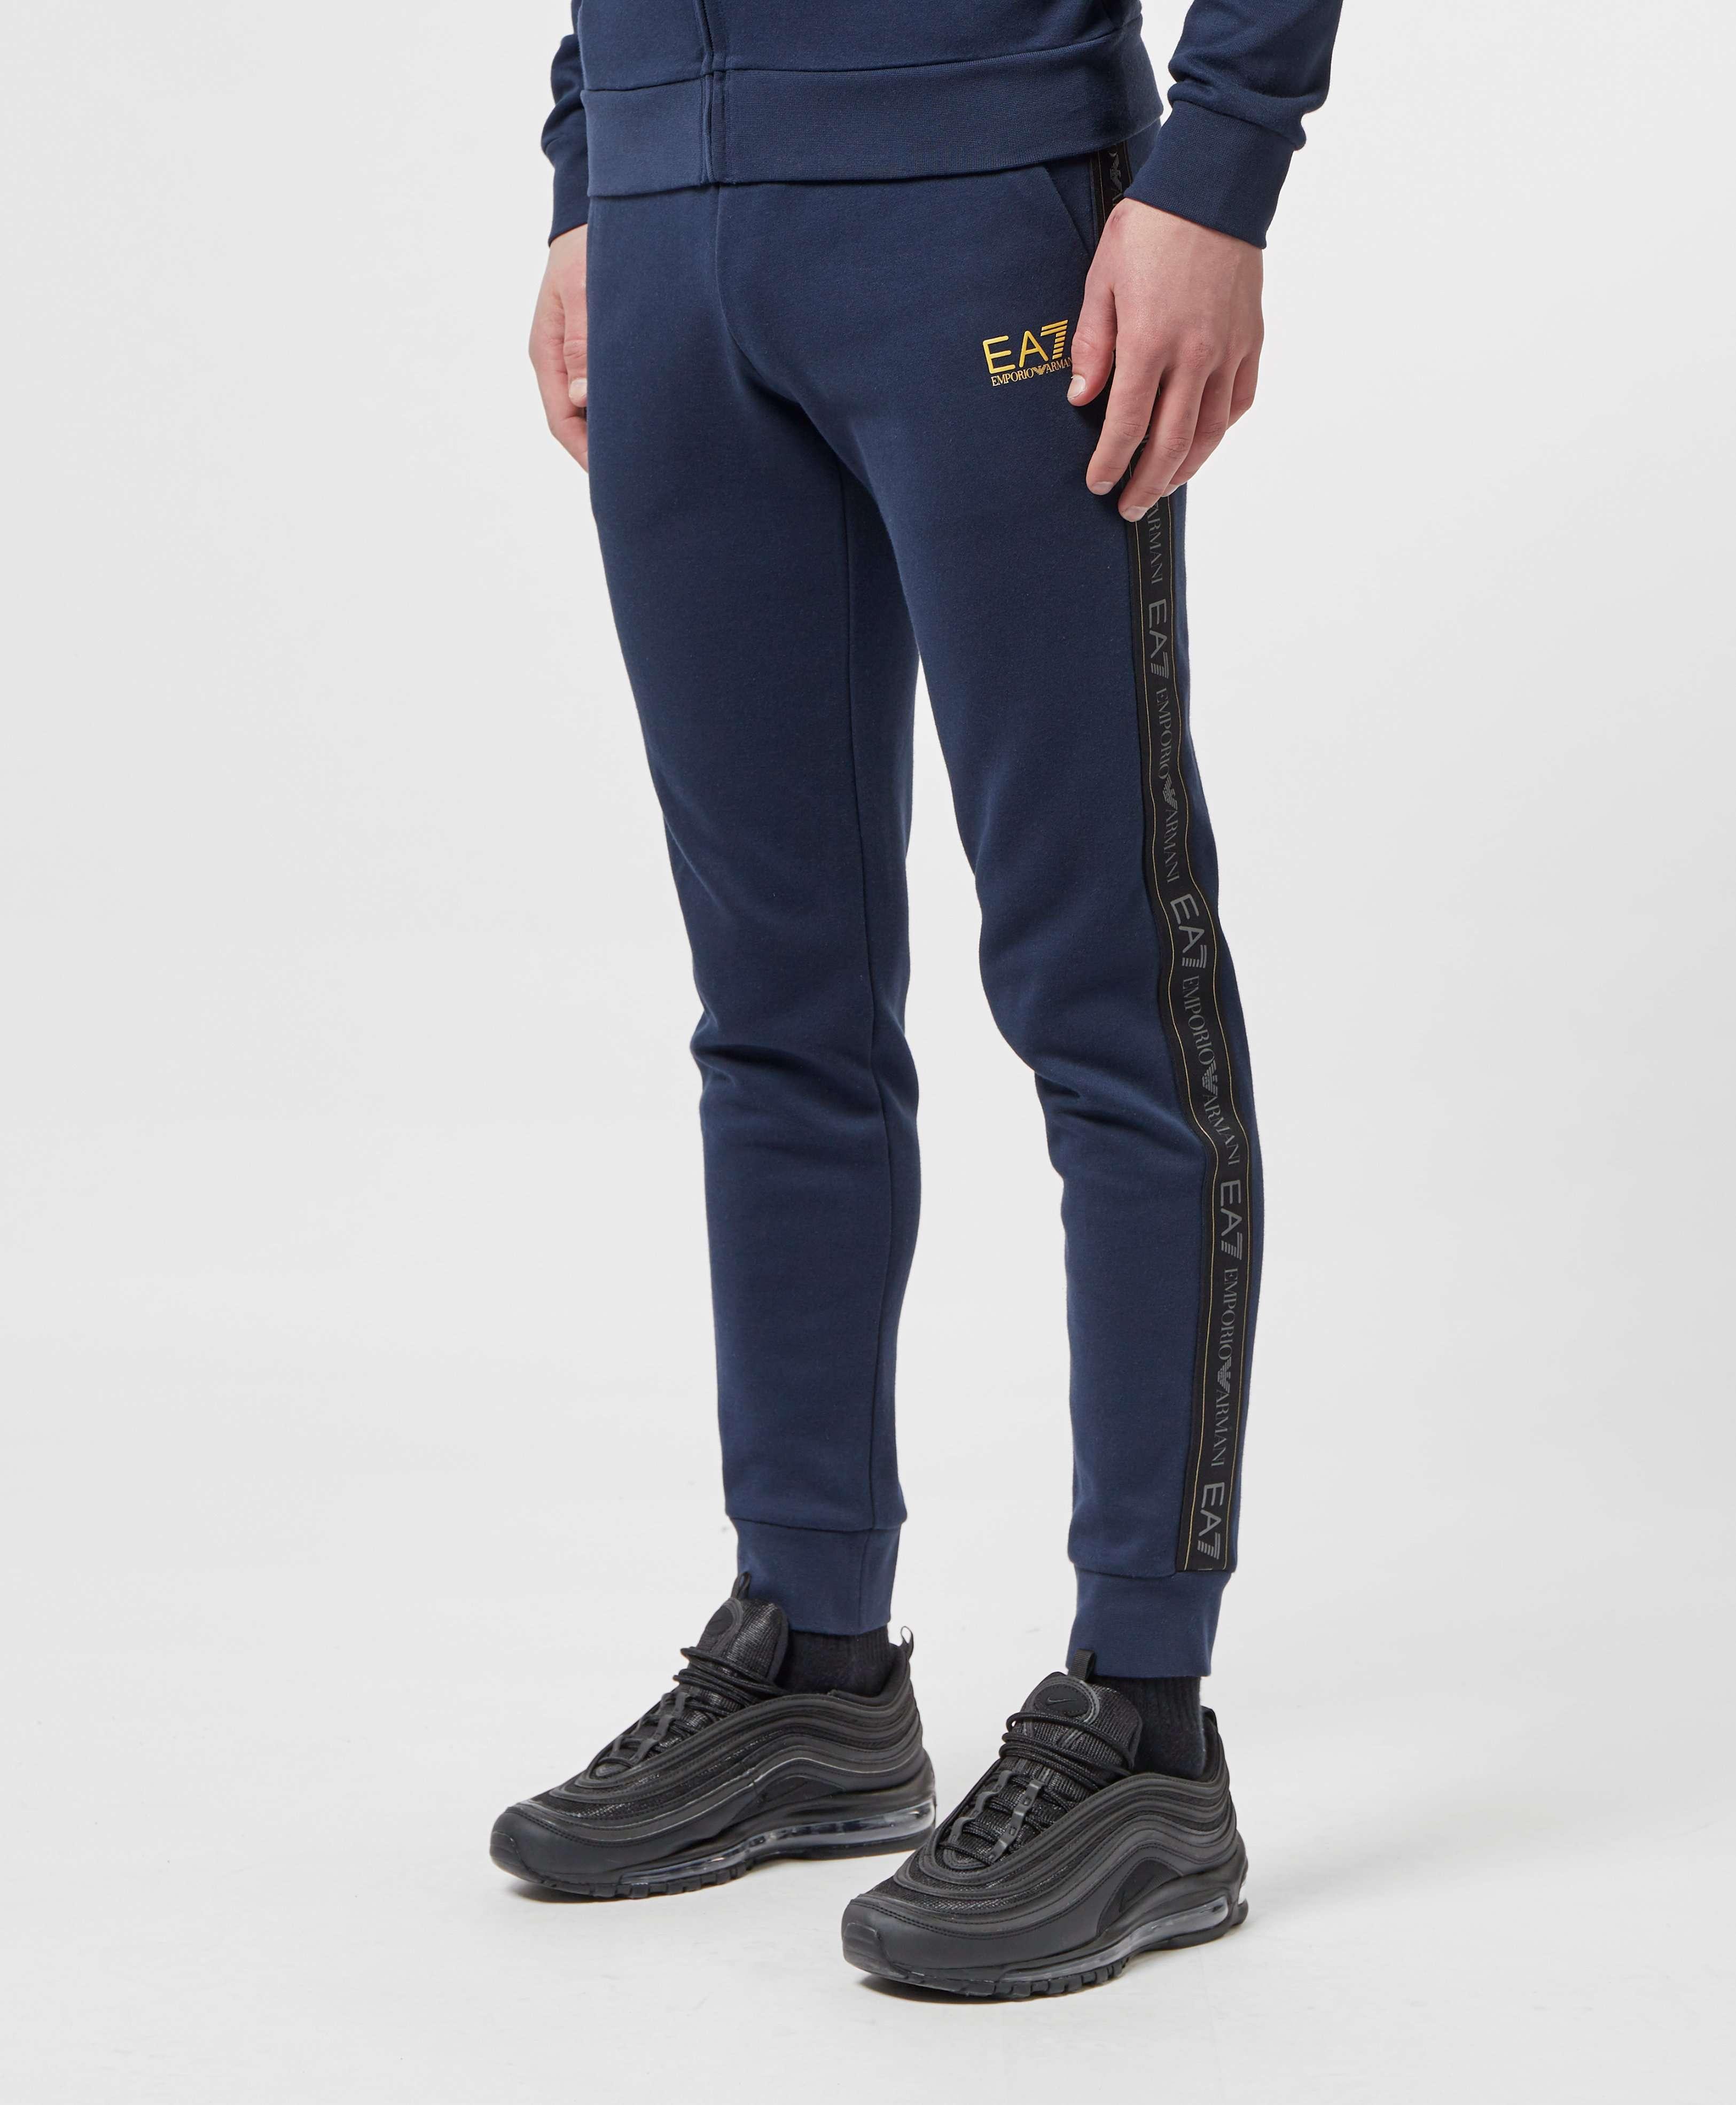 Emporio Armani EA7 Tape Cuffed Fleece Pants - Exclusive